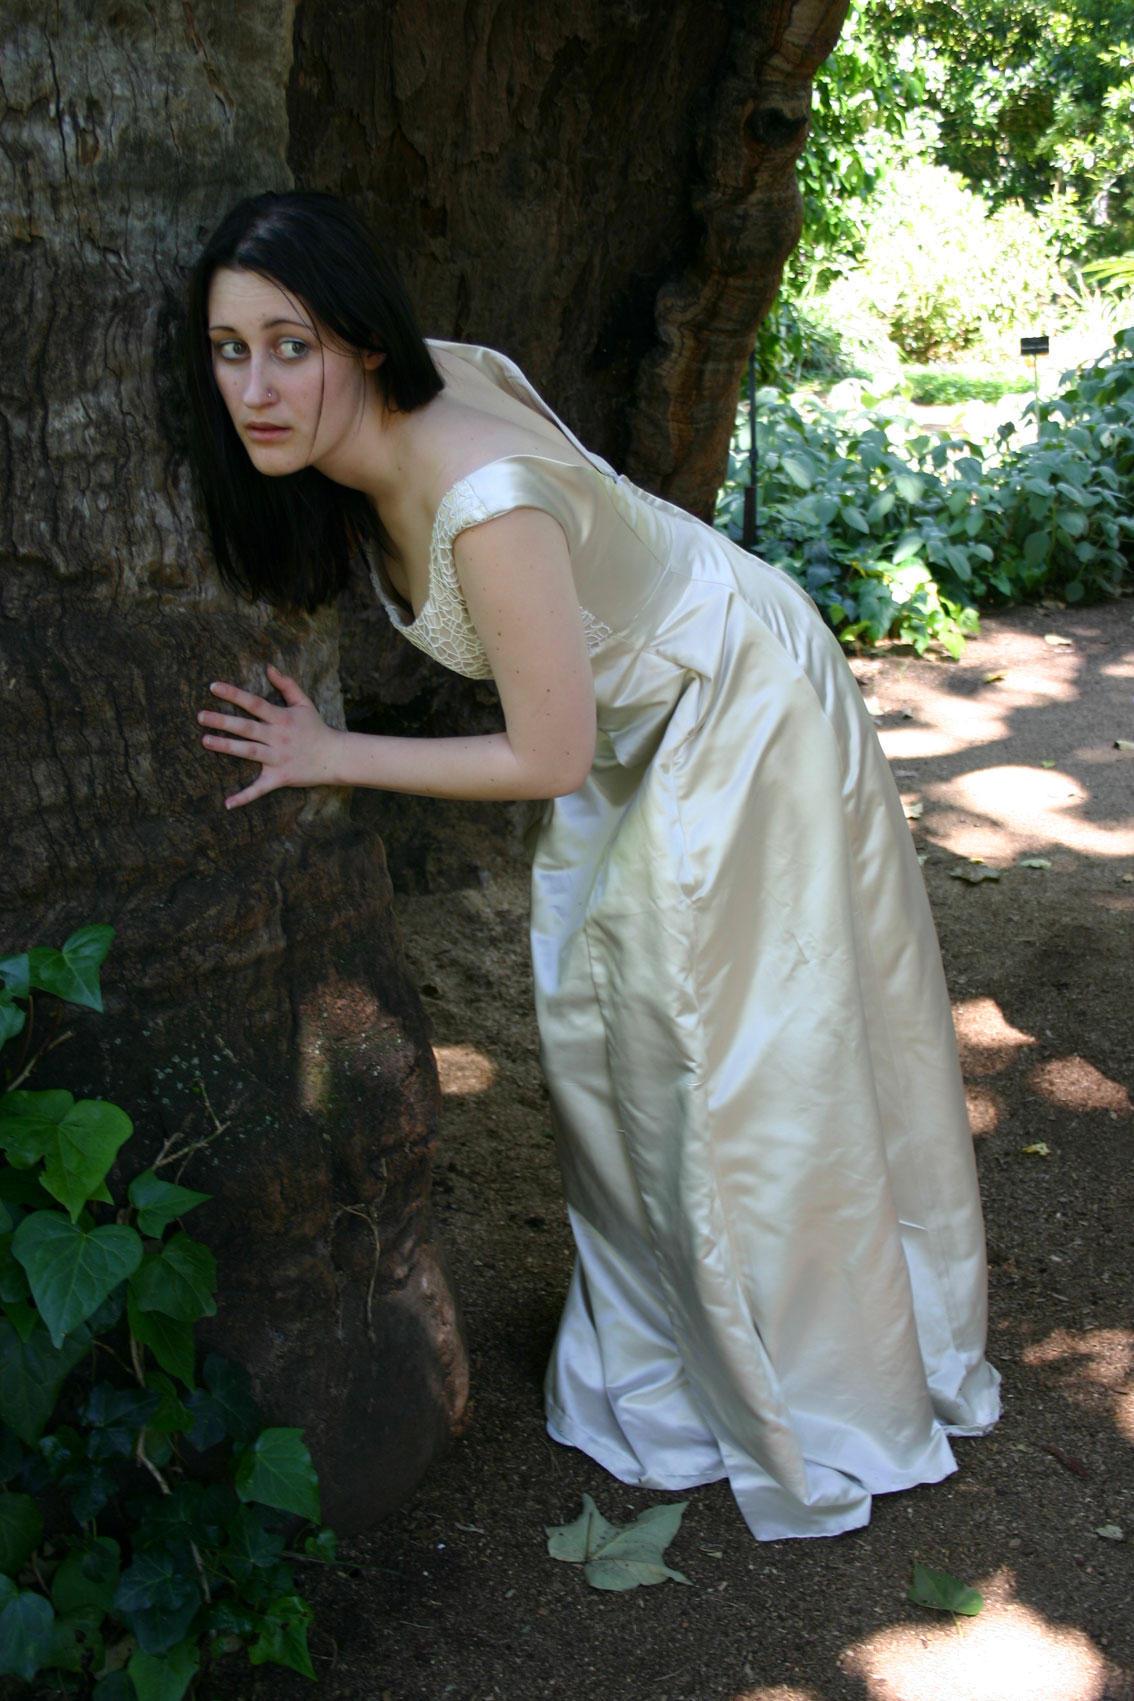 Princess Dress - 10 by ellenlovely-stock